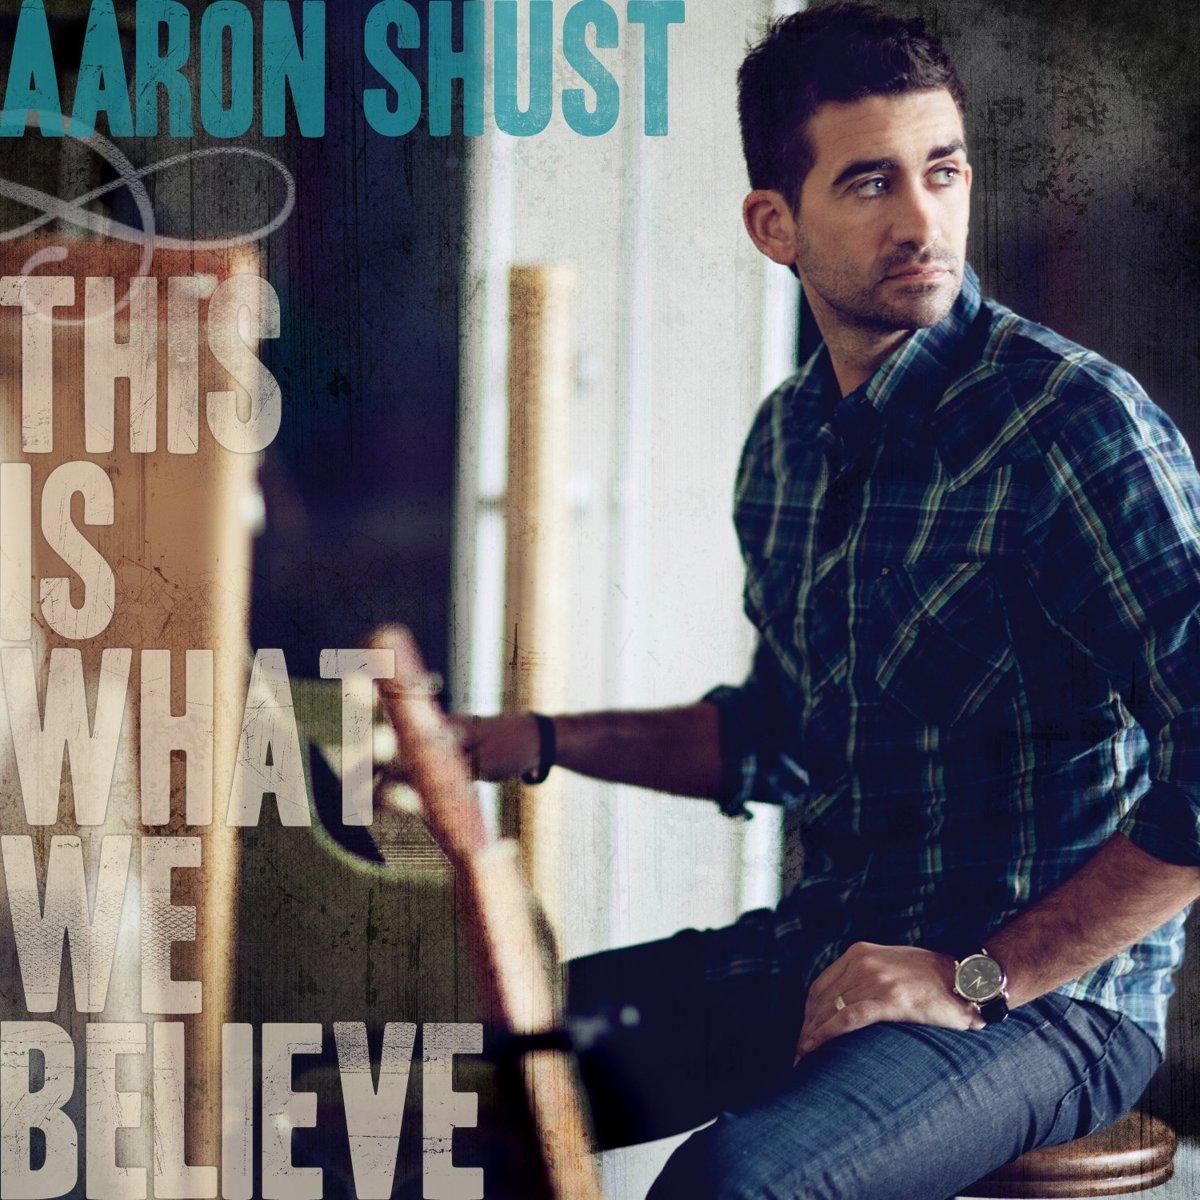 aaron shust This Is What We Believe